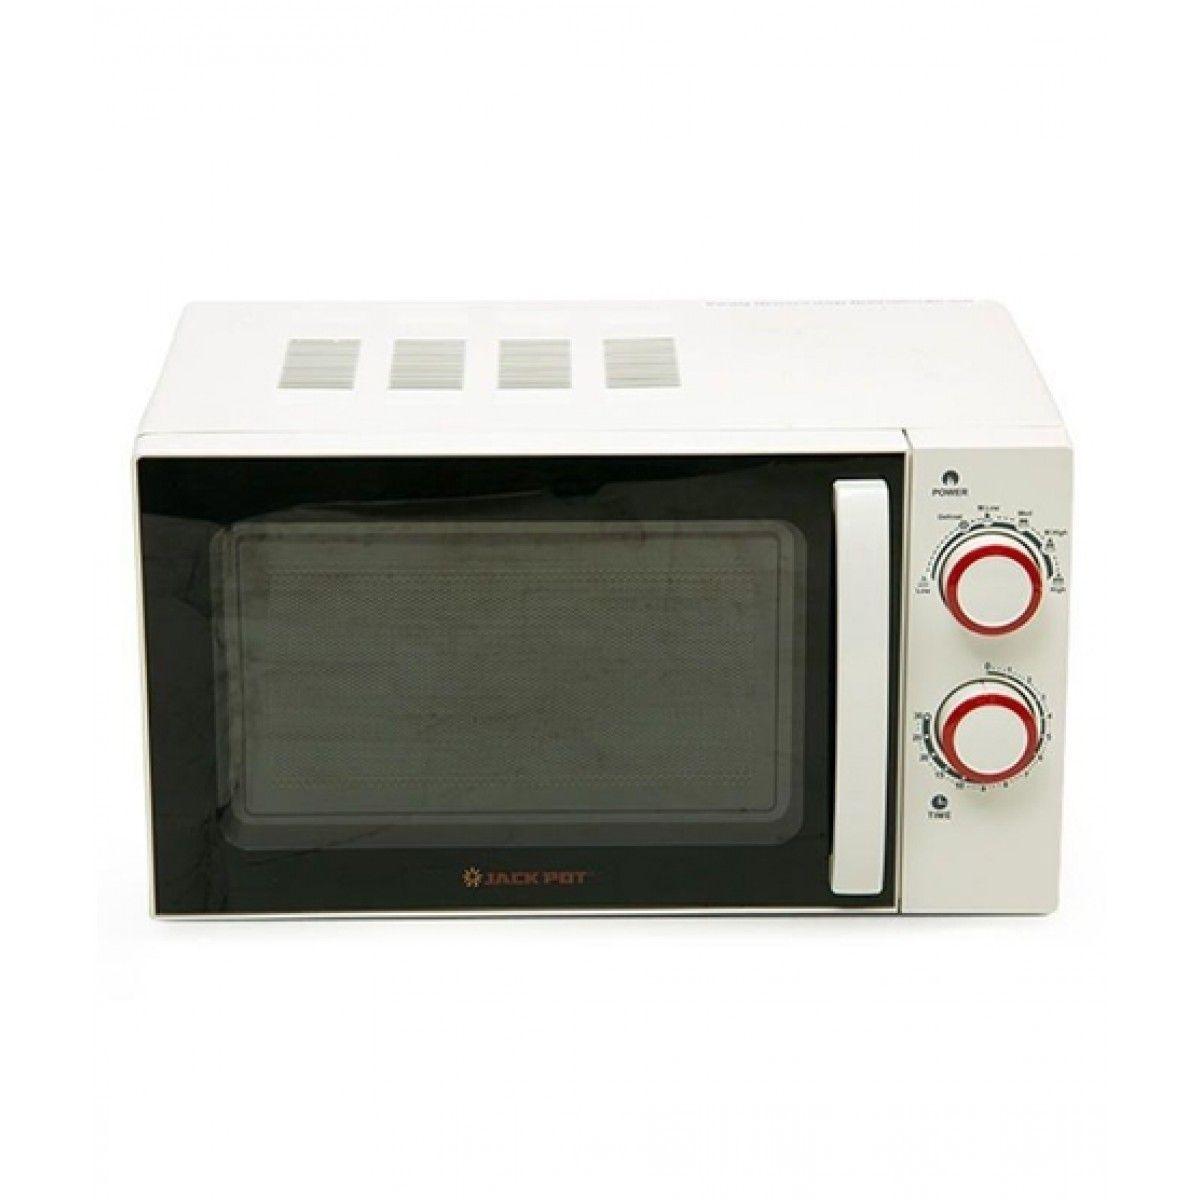 Jackpot JP-923 23Ltr Microwave Oven